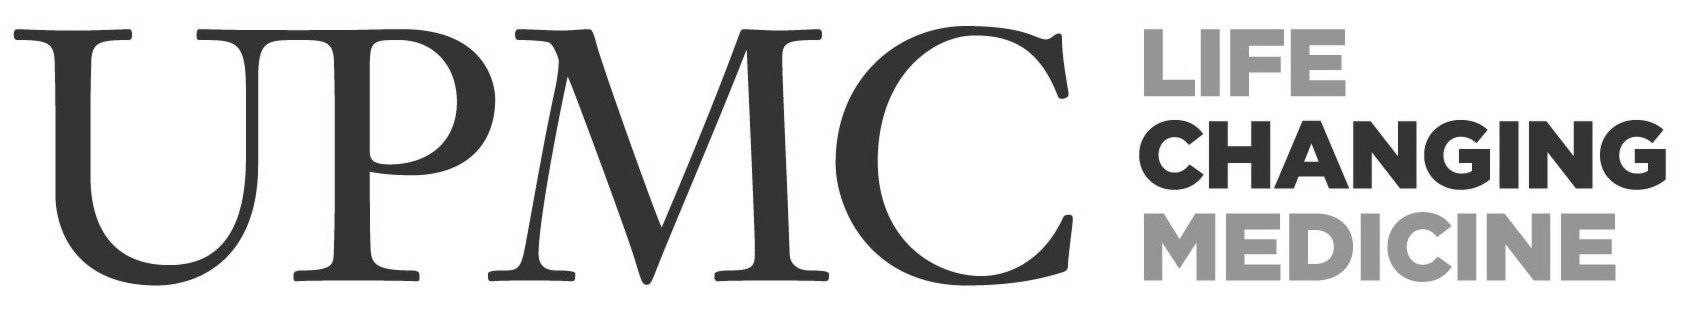 UPMC-logo.jpg